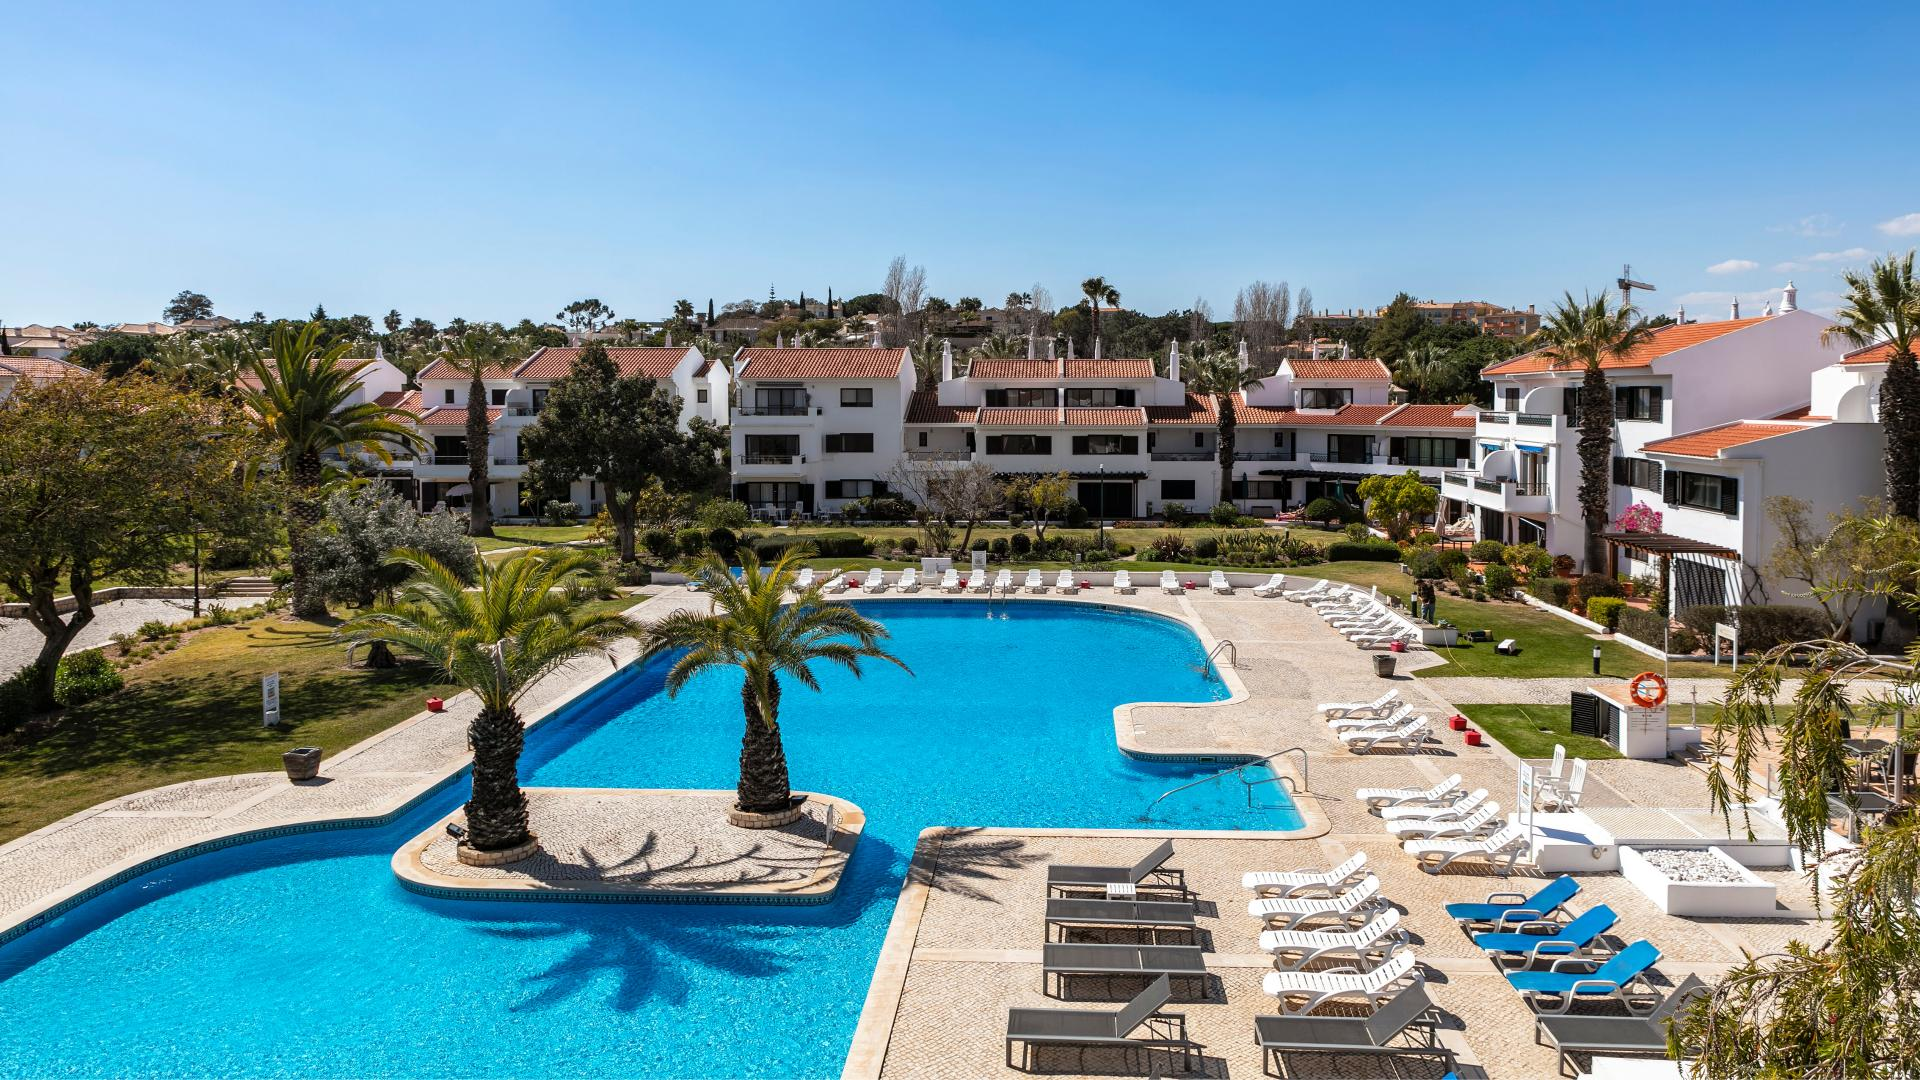 Apartment Lake Daze - Lakeside Village, Quinta do Lago, Algarve - 4_1.png